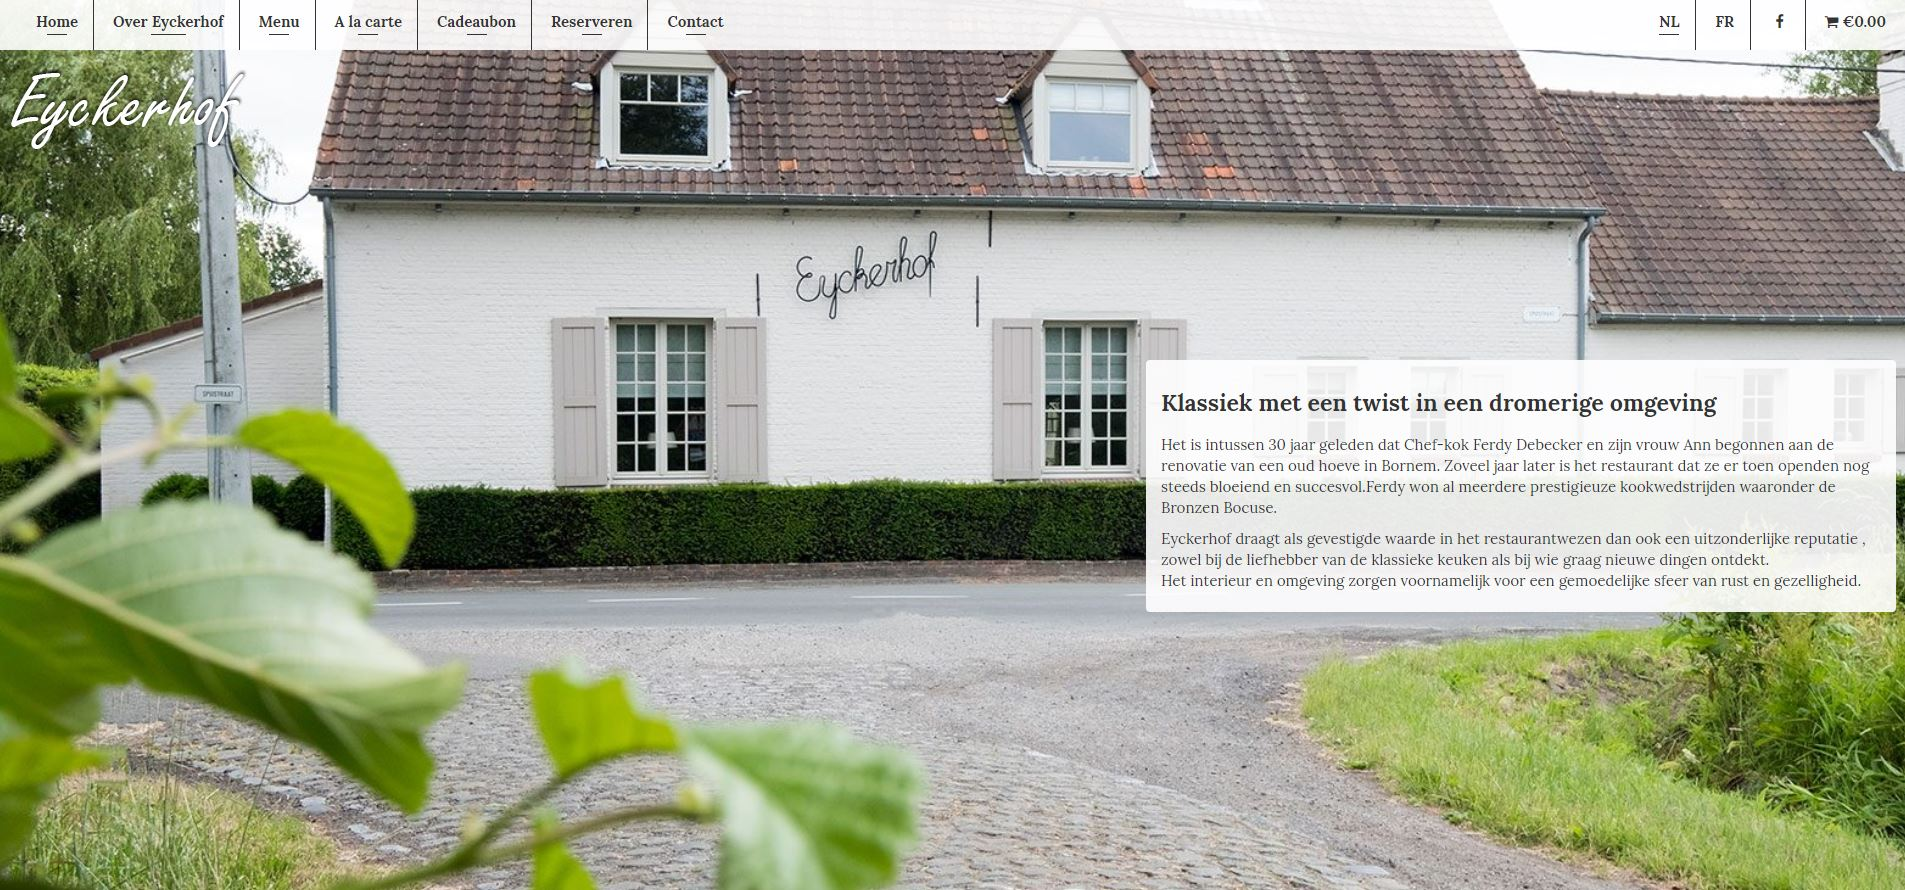 Eyckerhof 1